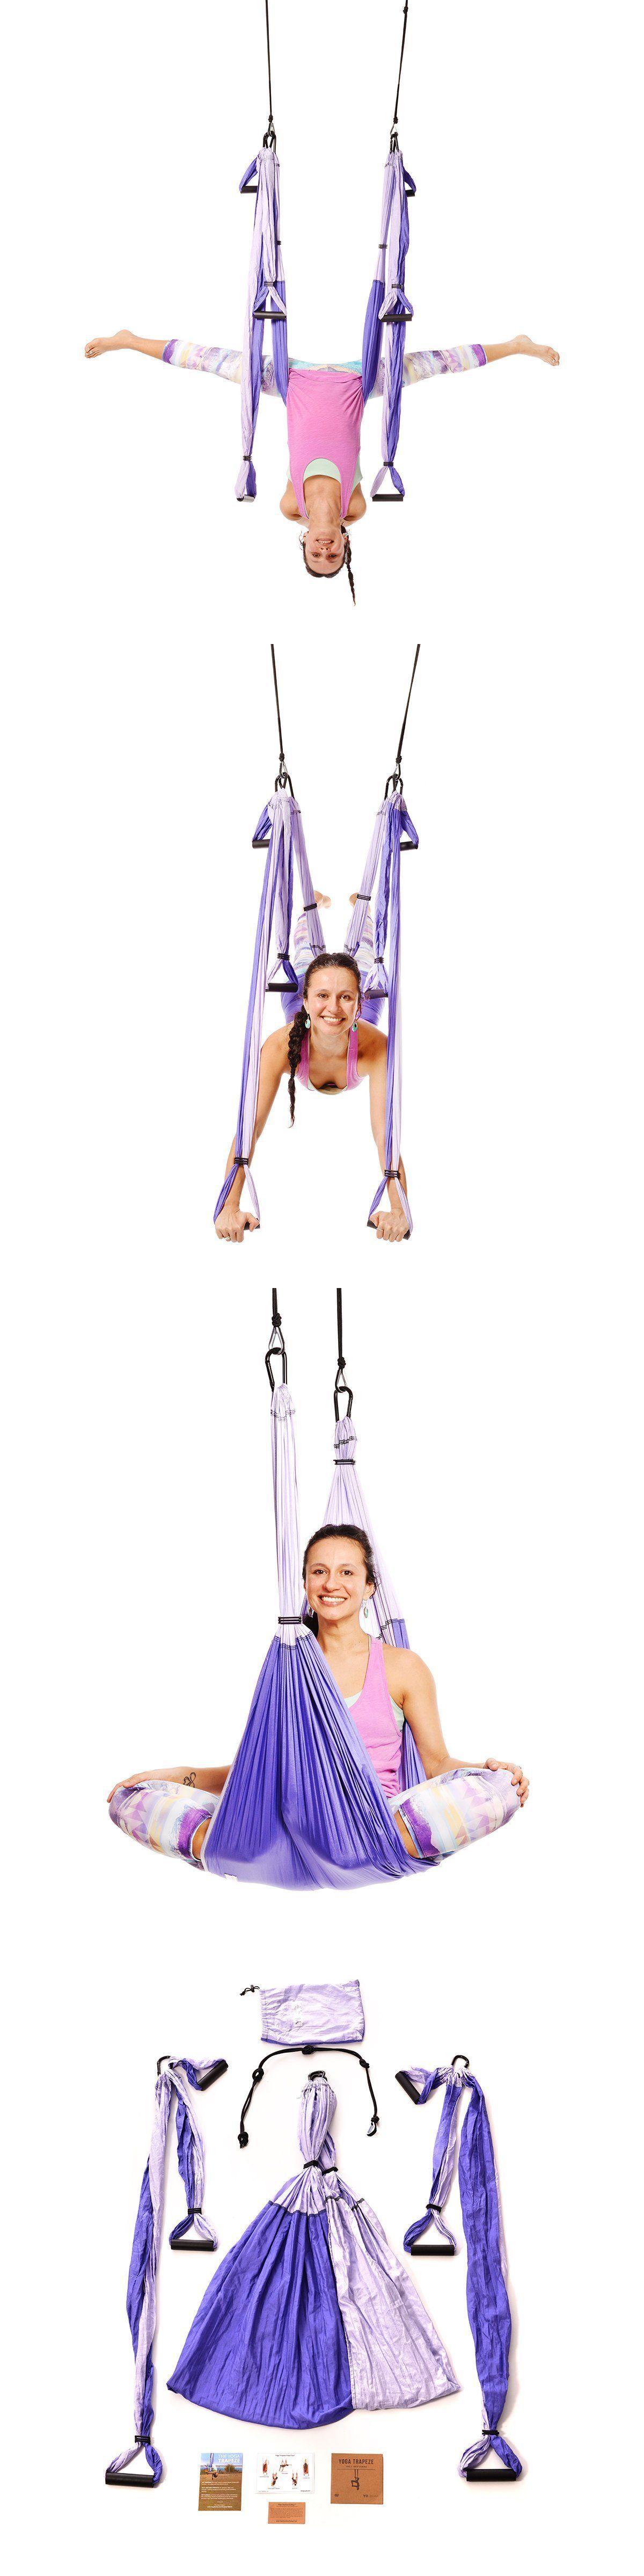 Yoga props yoga trapeze swing sling inversion tool joyful